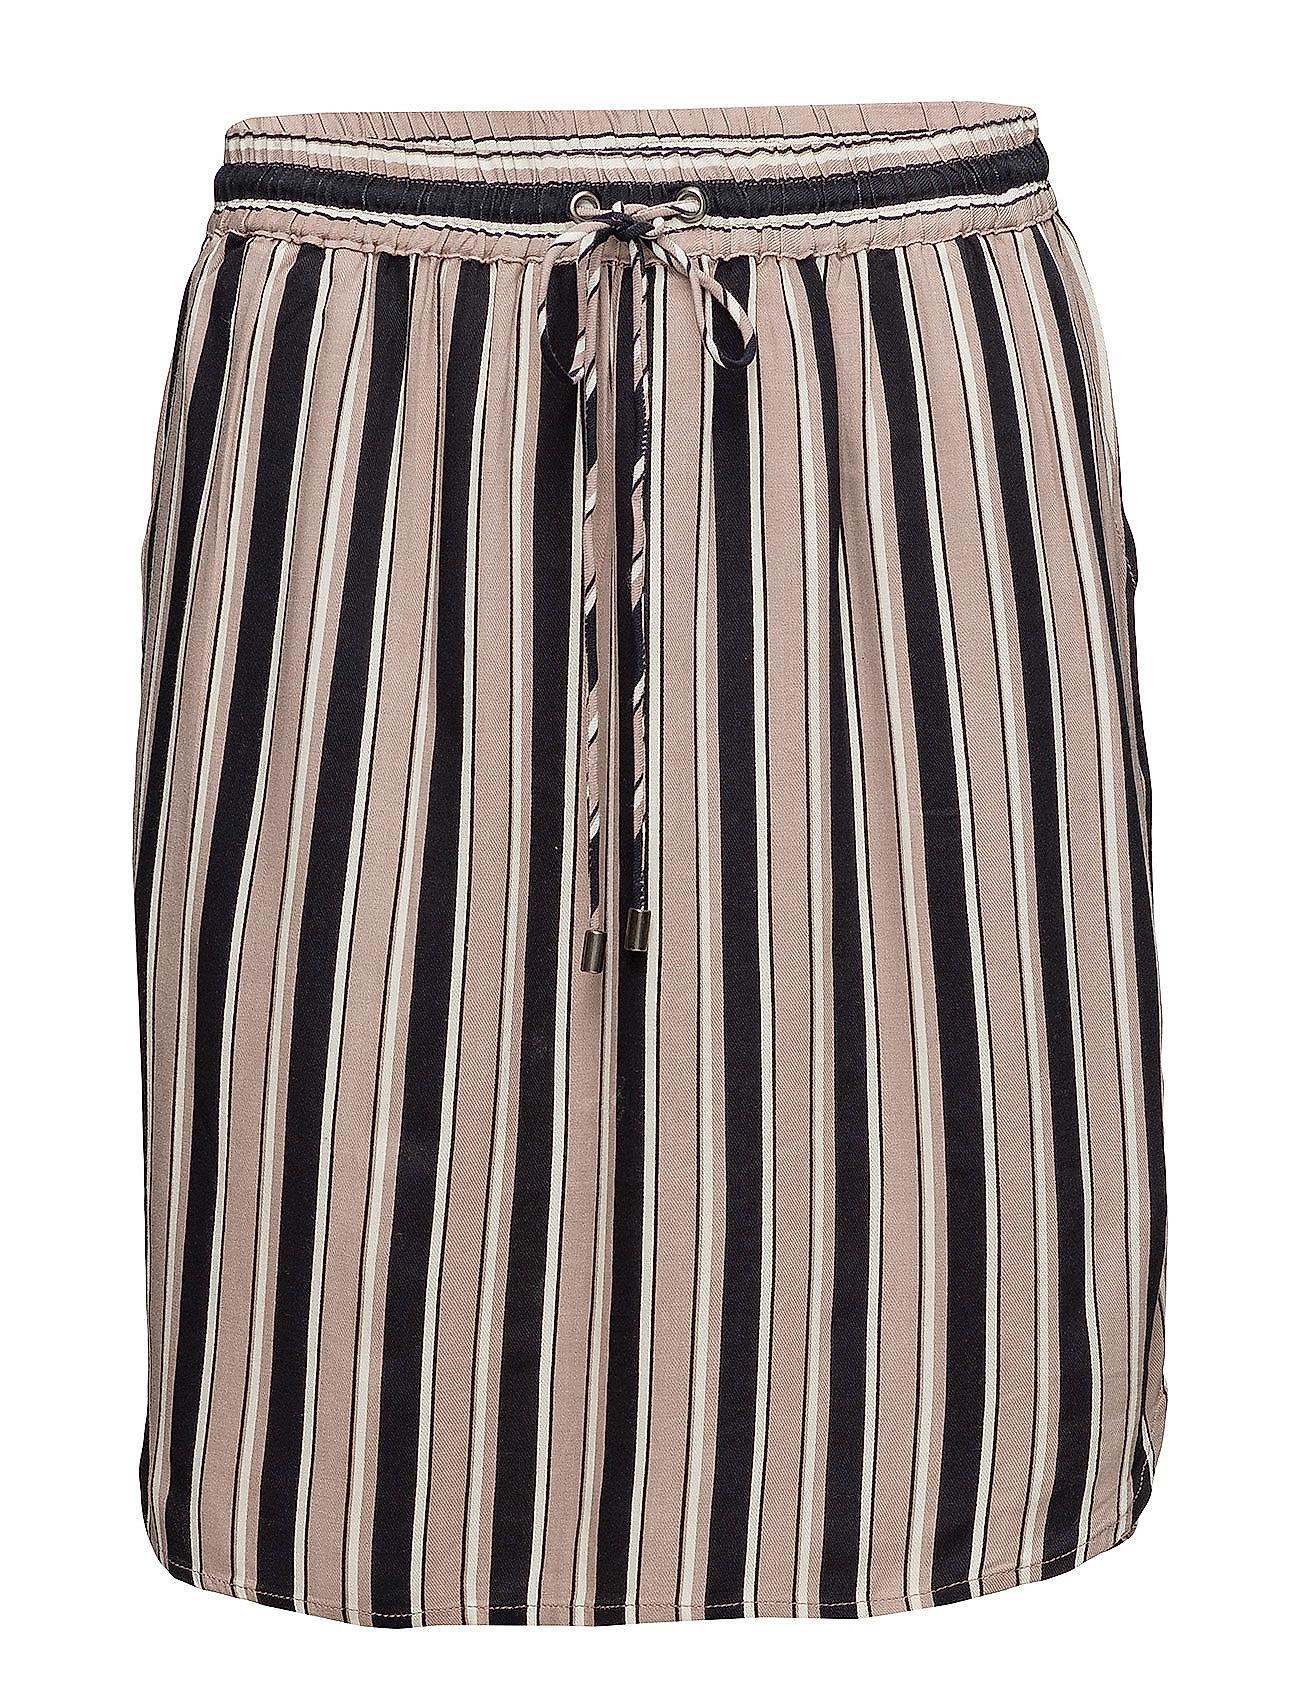 Image of Stripe P Skirt (2926681035)